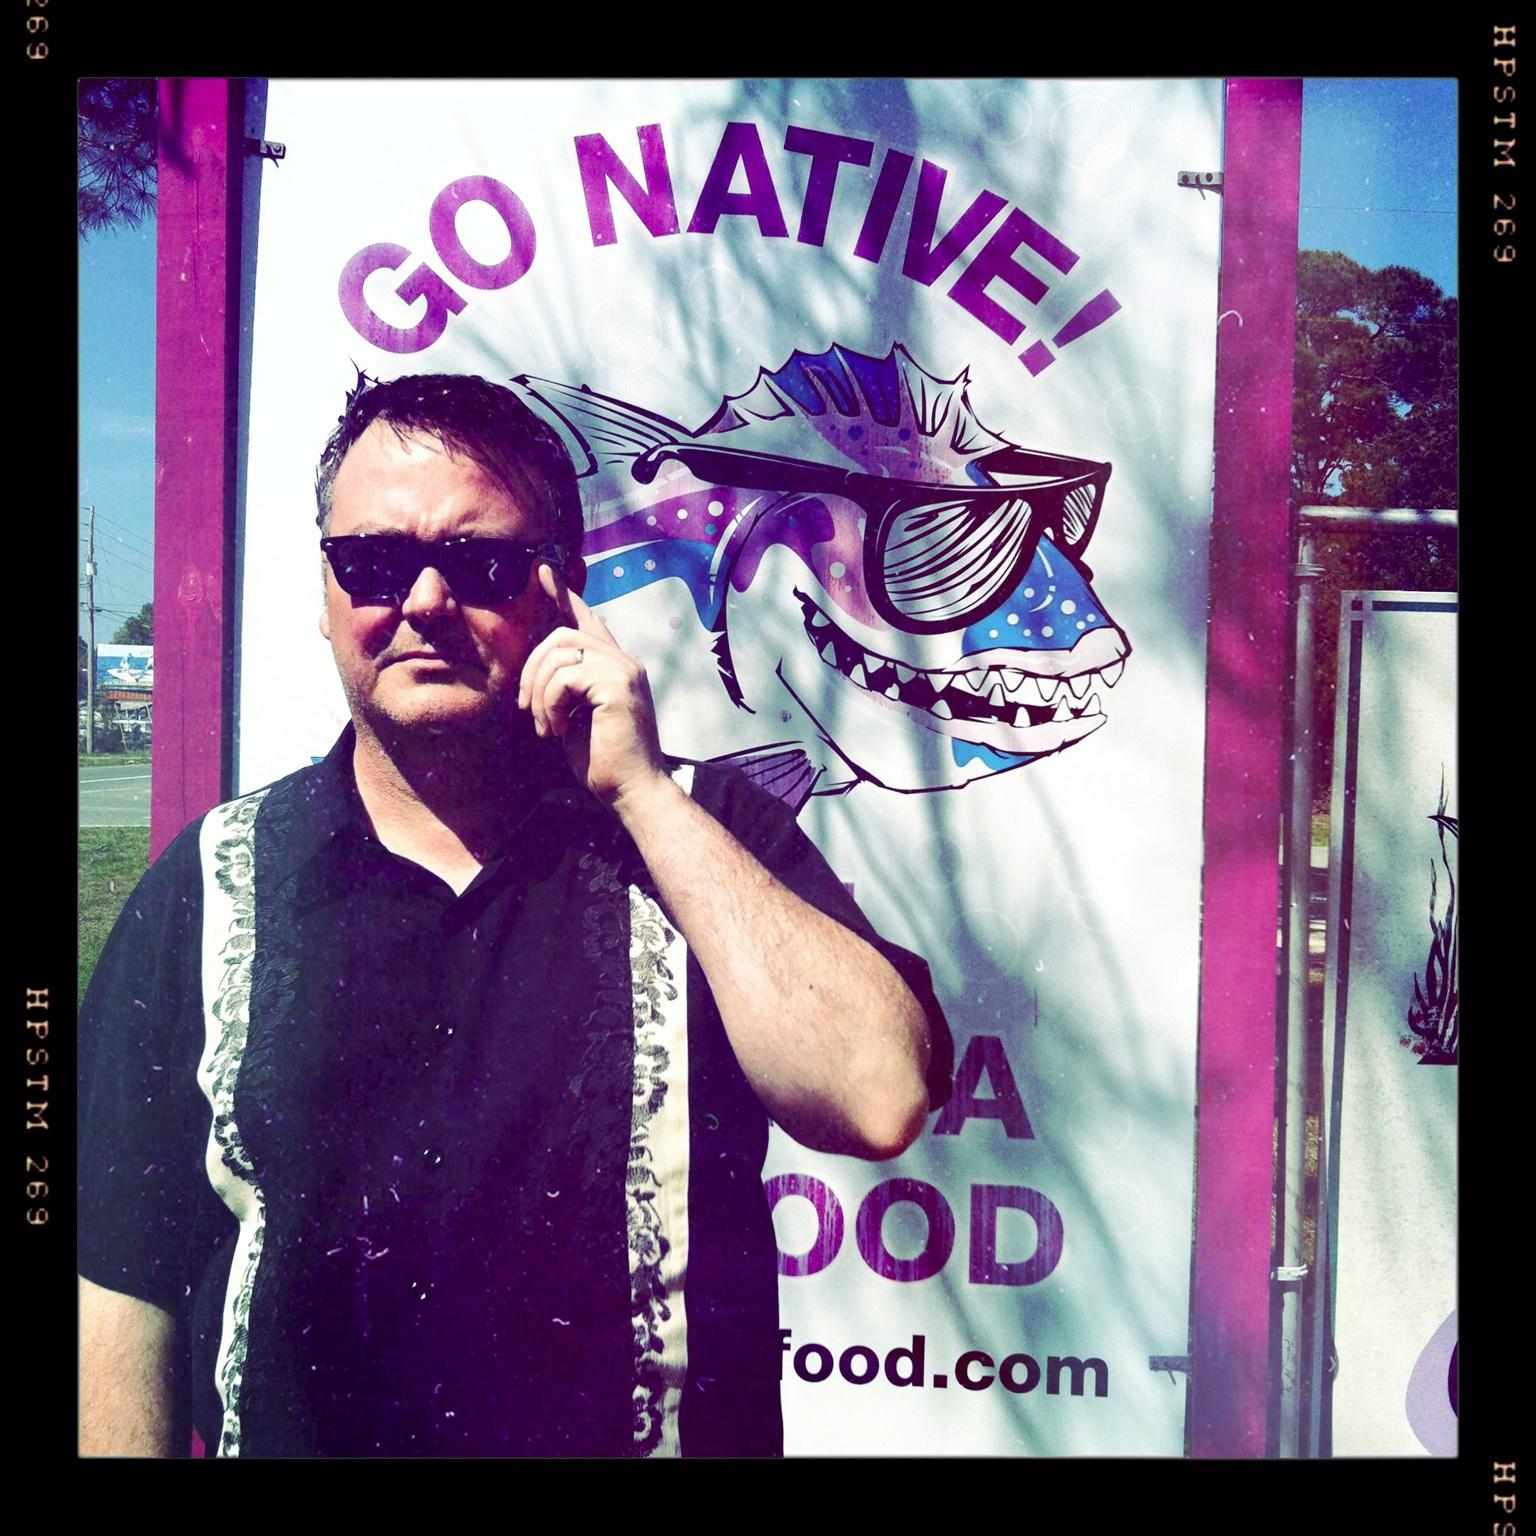 Art Go Native